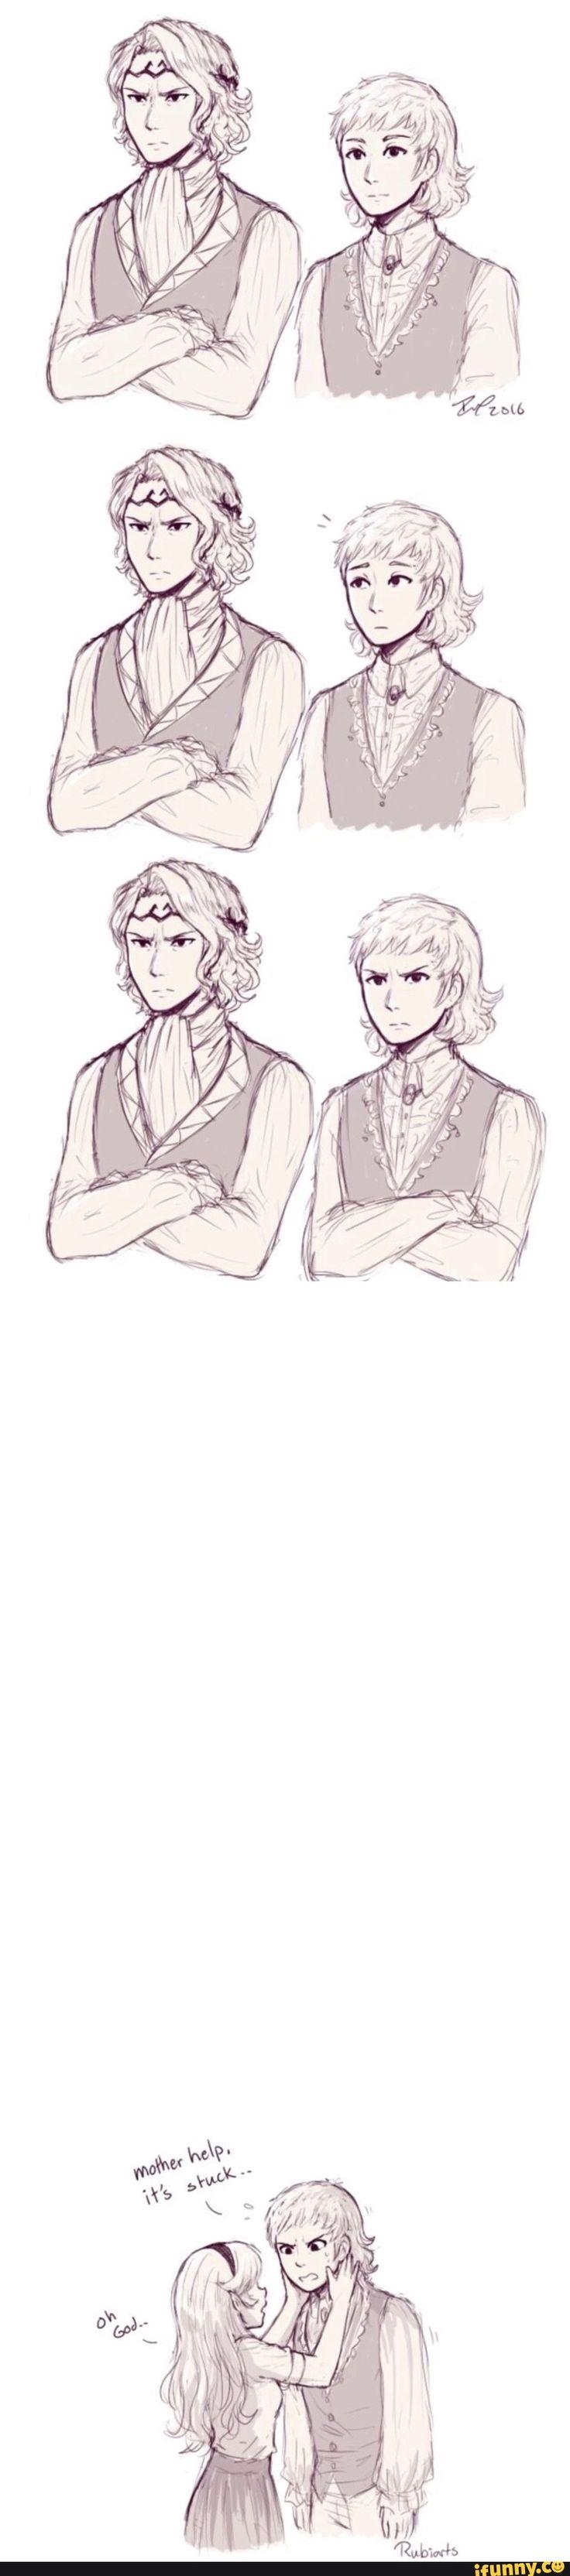 Fire Emblem Fates - Xander and Siegbert - like father like son.